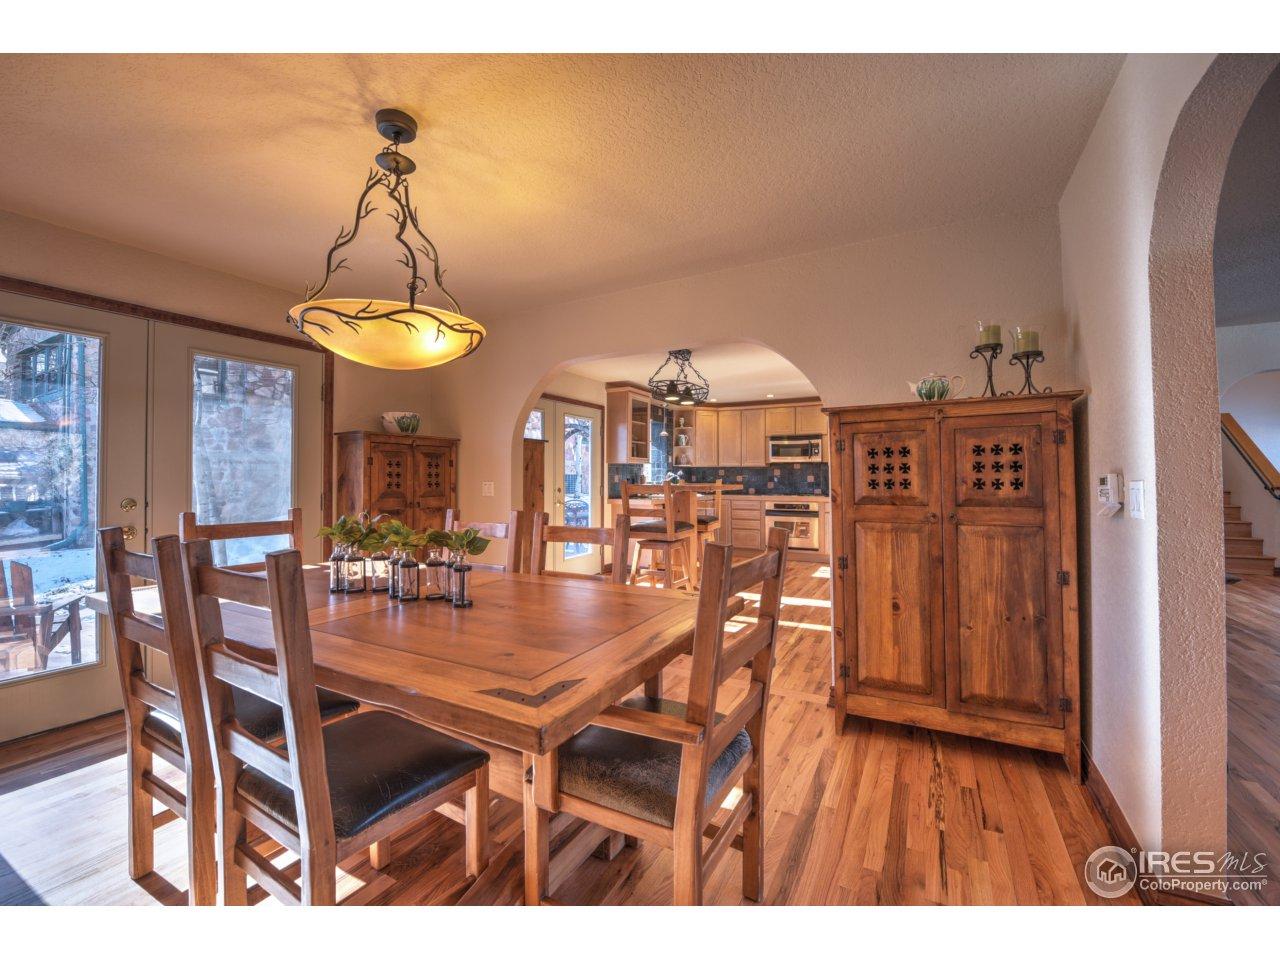 Diningroom into kitchen